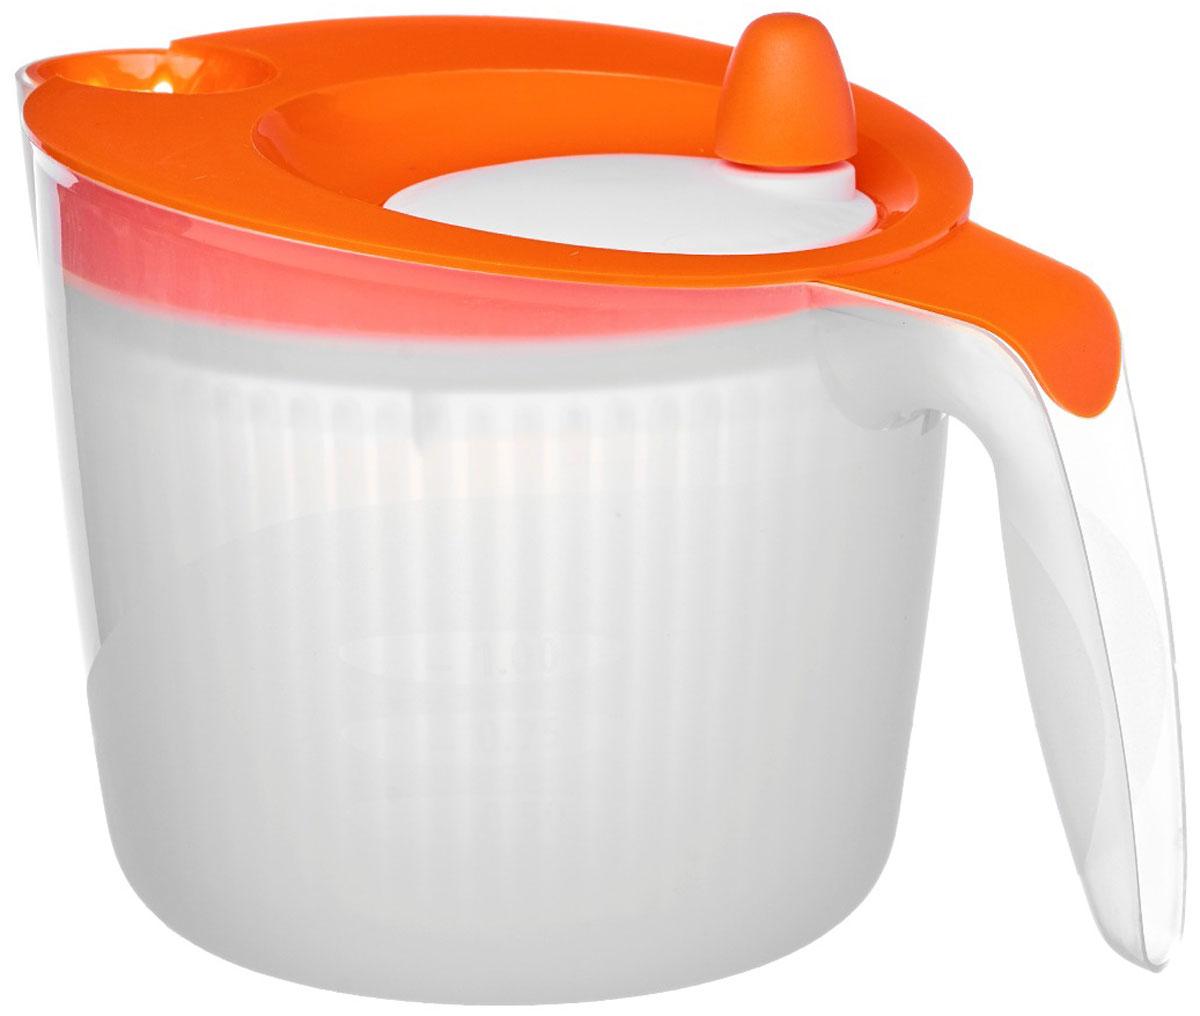 Сушилка для салата Walmer Rainbow, цвет: оранжевый, 1,8 лW26010018_оранж